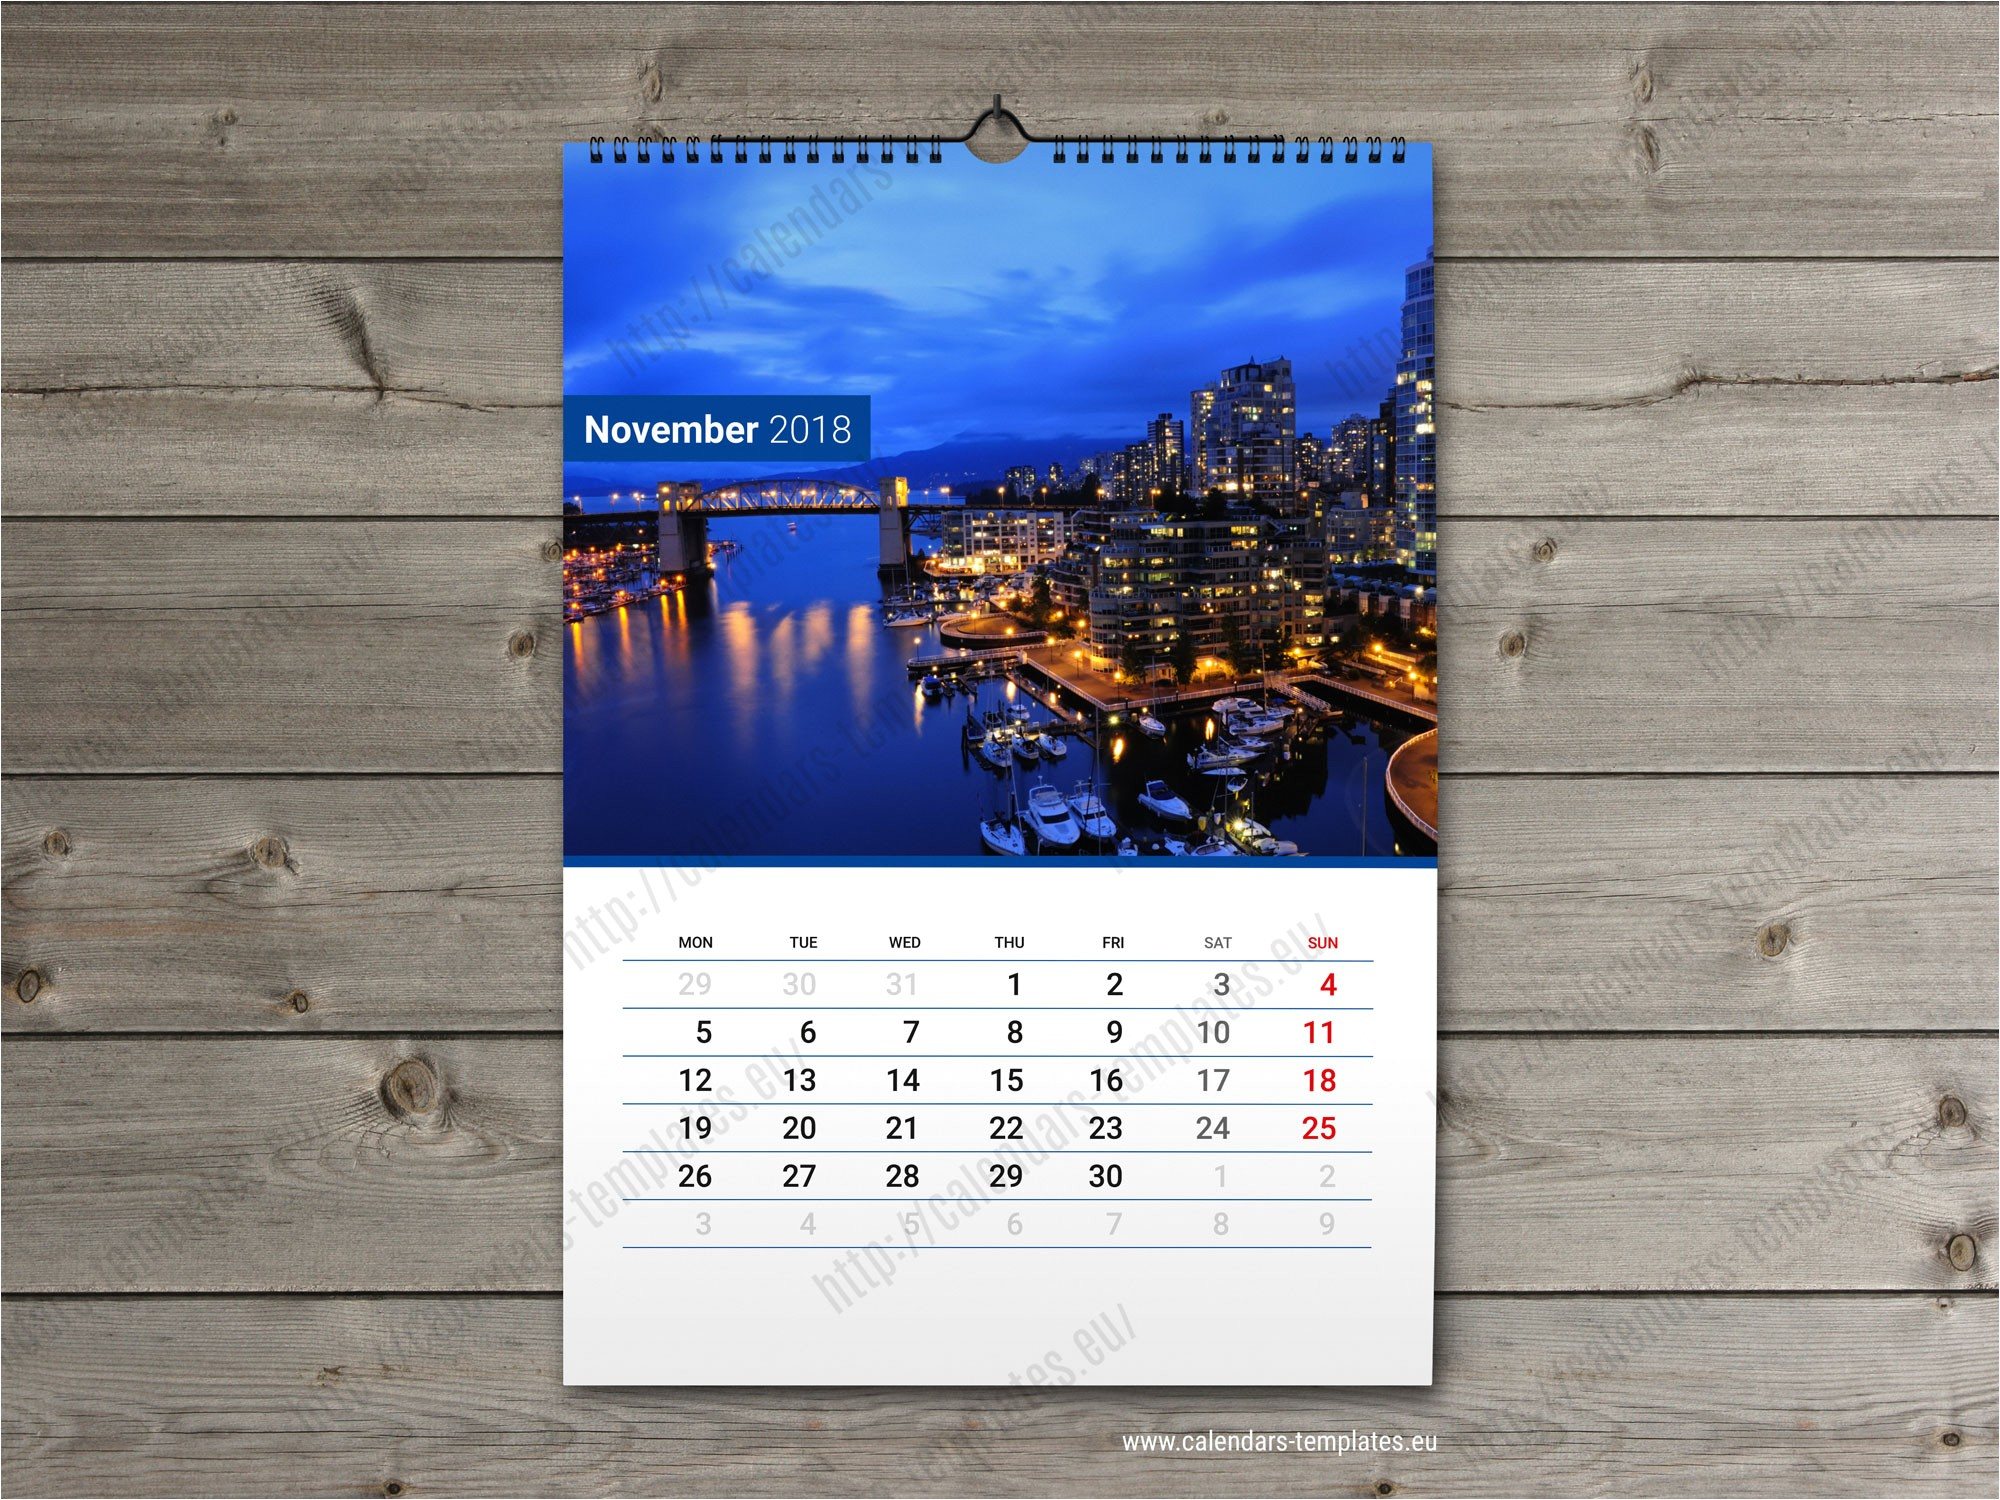 printable calendar kw13 w5